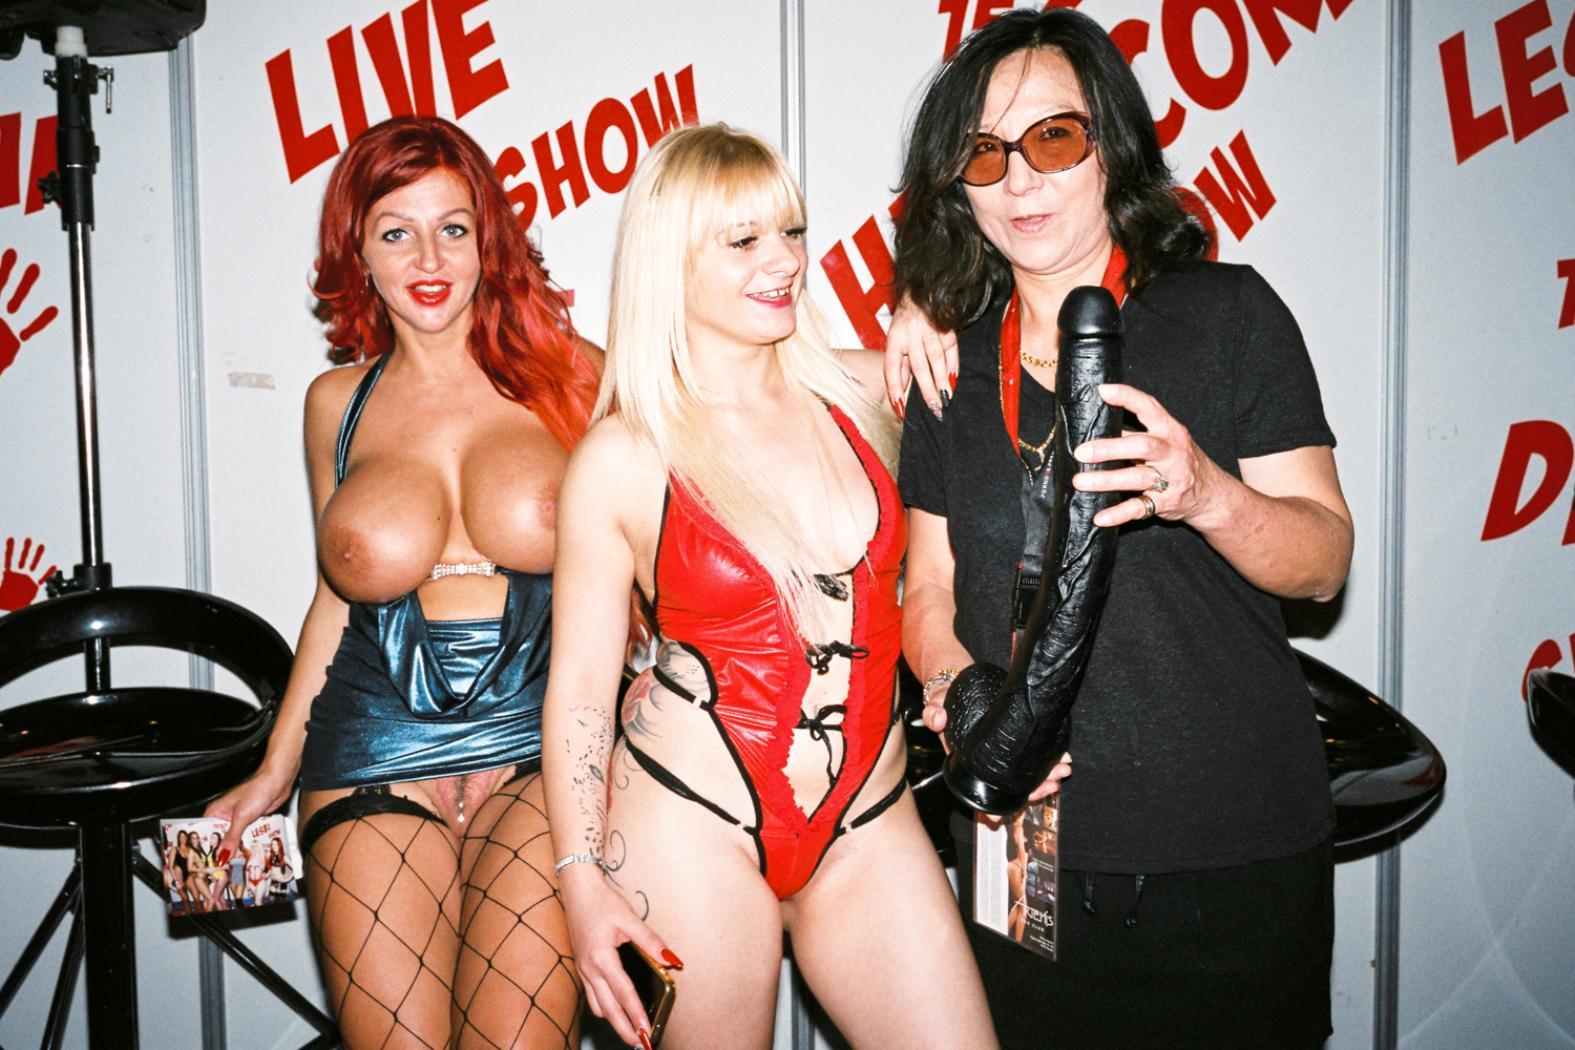 jonge lesbiennes porno